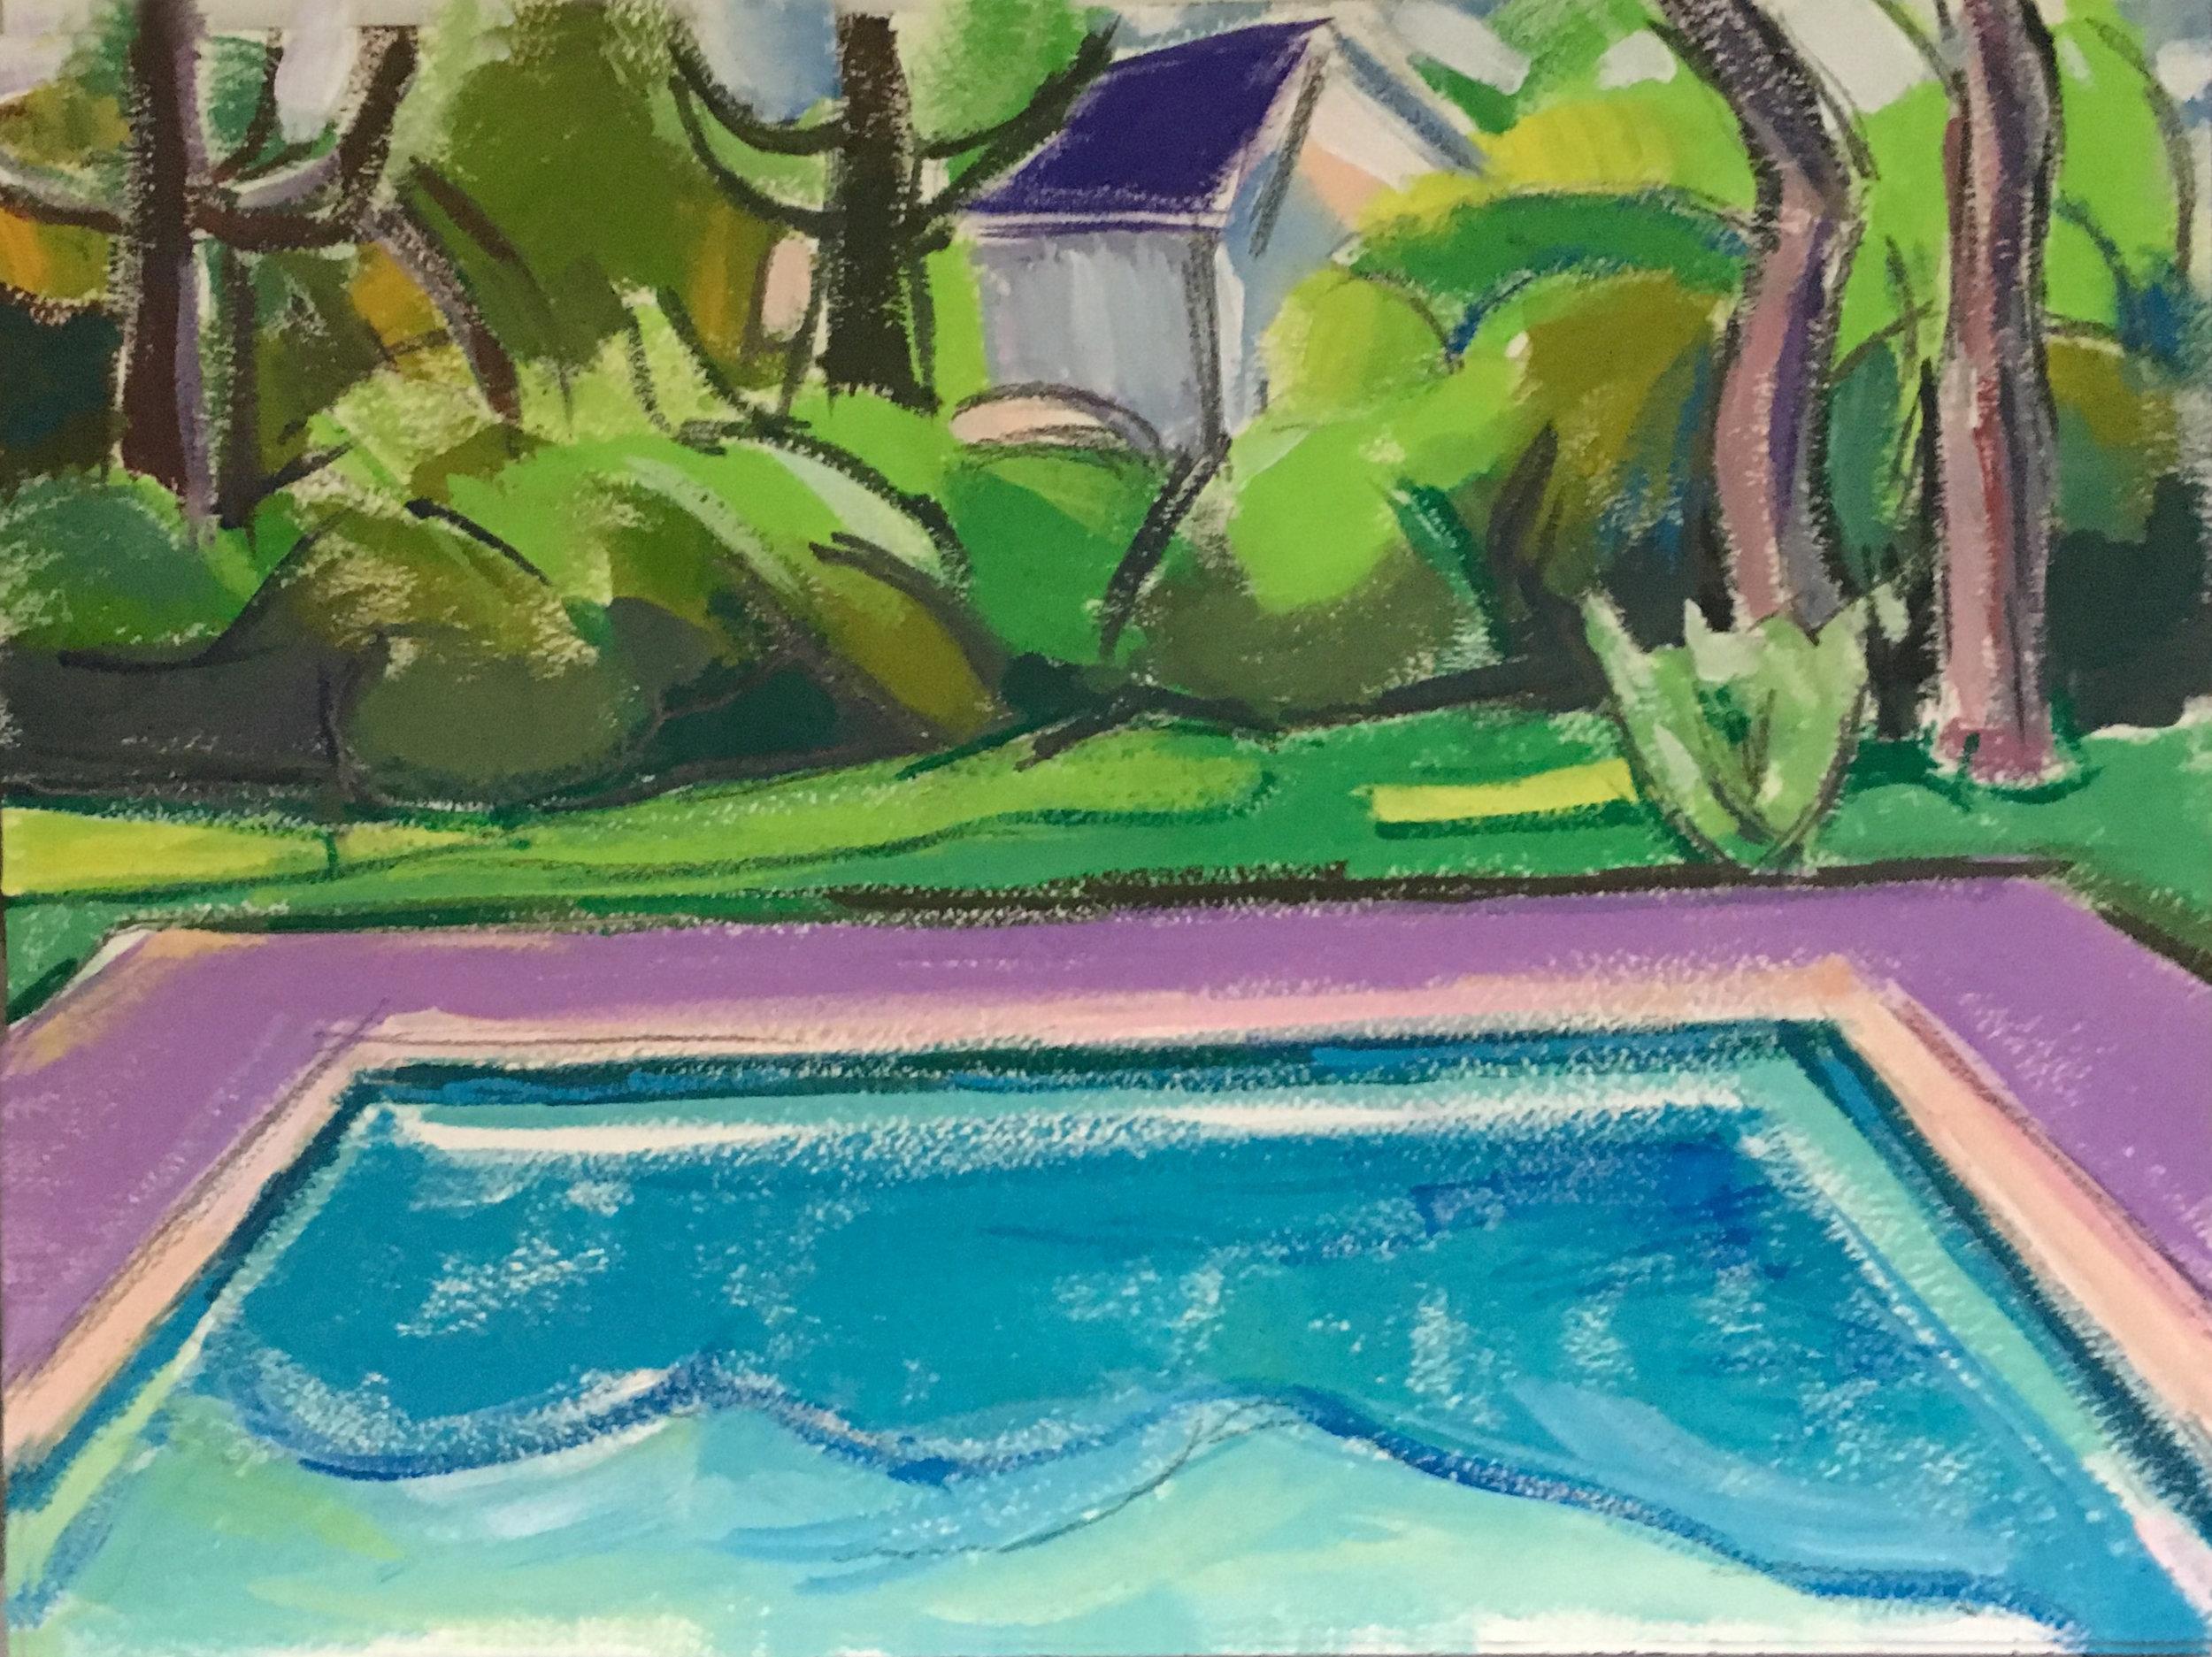 Pool Study II,  gouache, 9 x 12 in., 2017